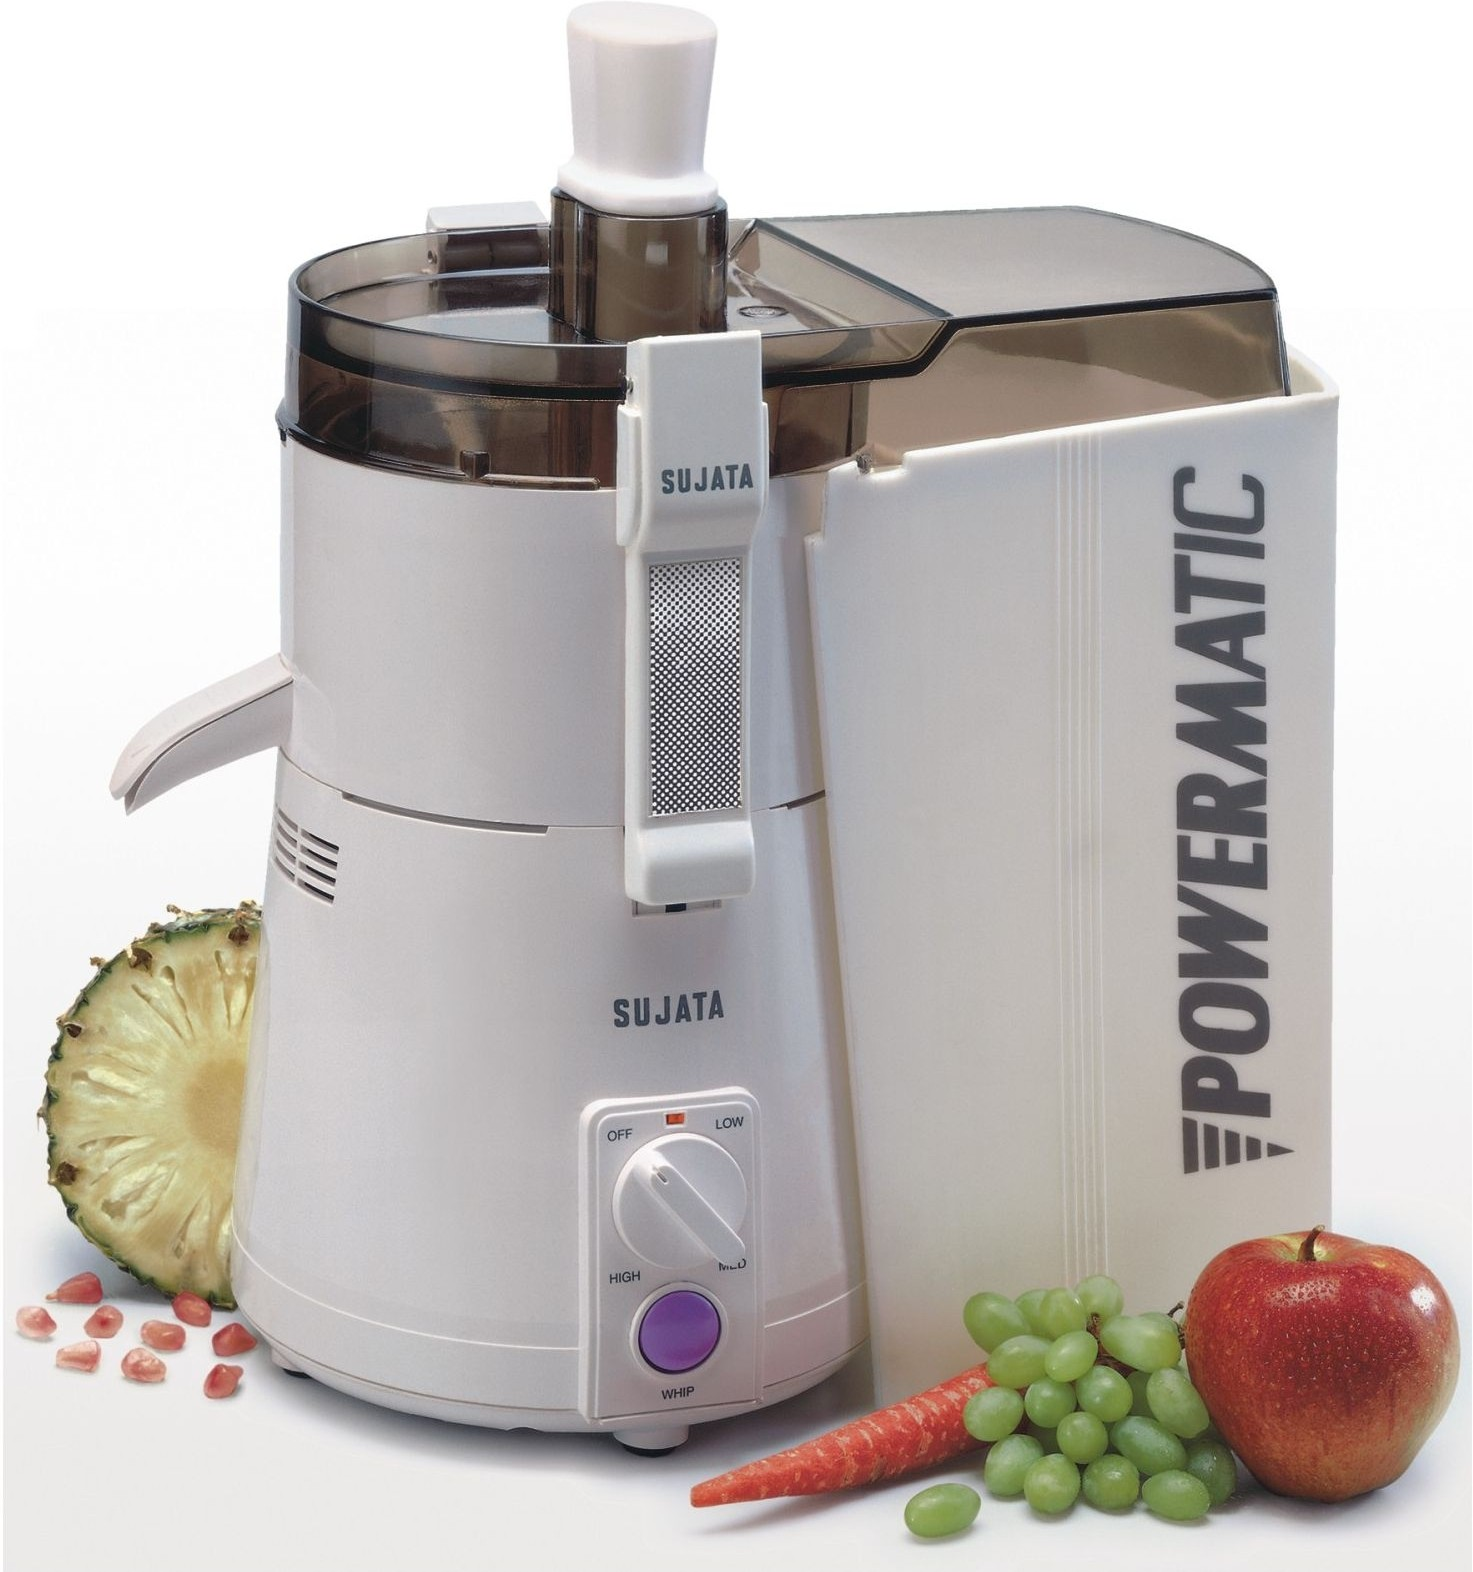 Kitchen Furniture Online India Sujata Powermatic 810 W Juicer Price In India Buy Sujata